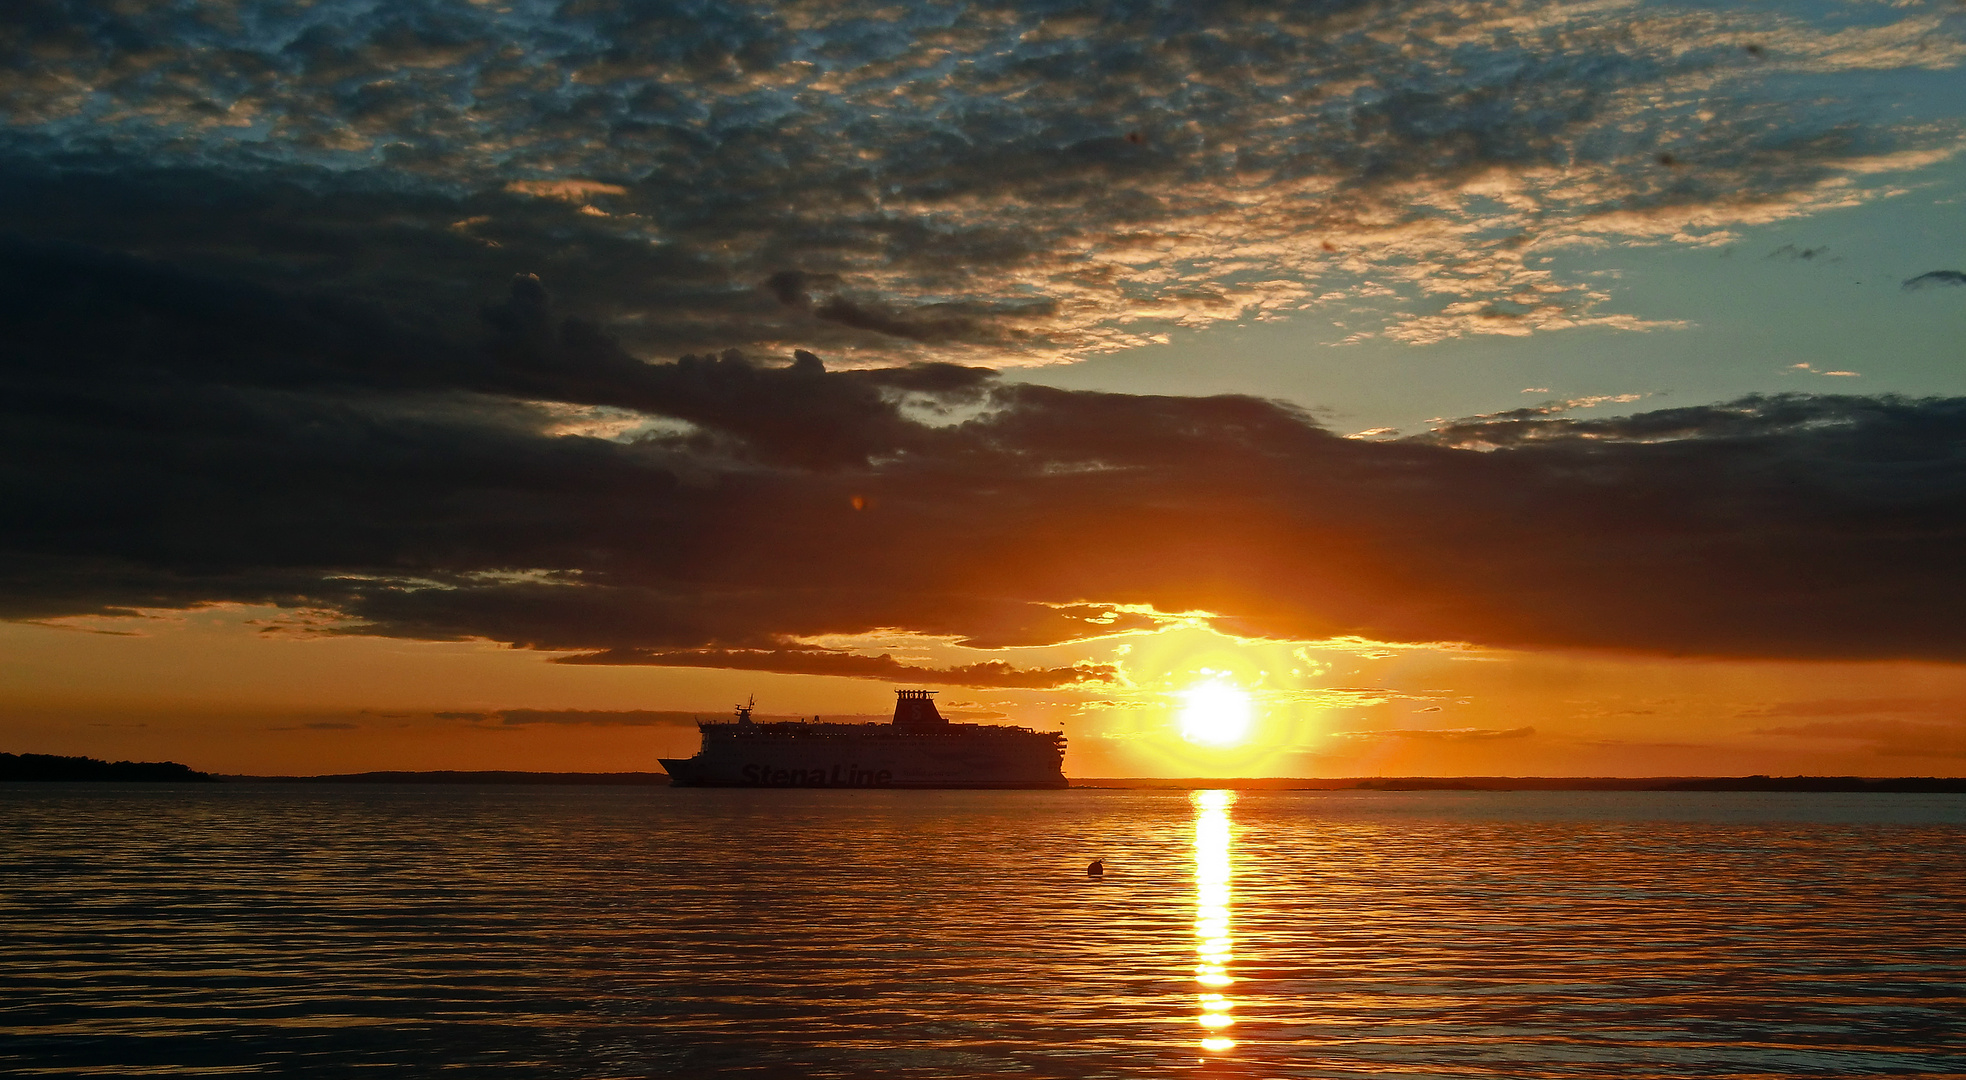 Sonnenuntergang bei Karlskrona